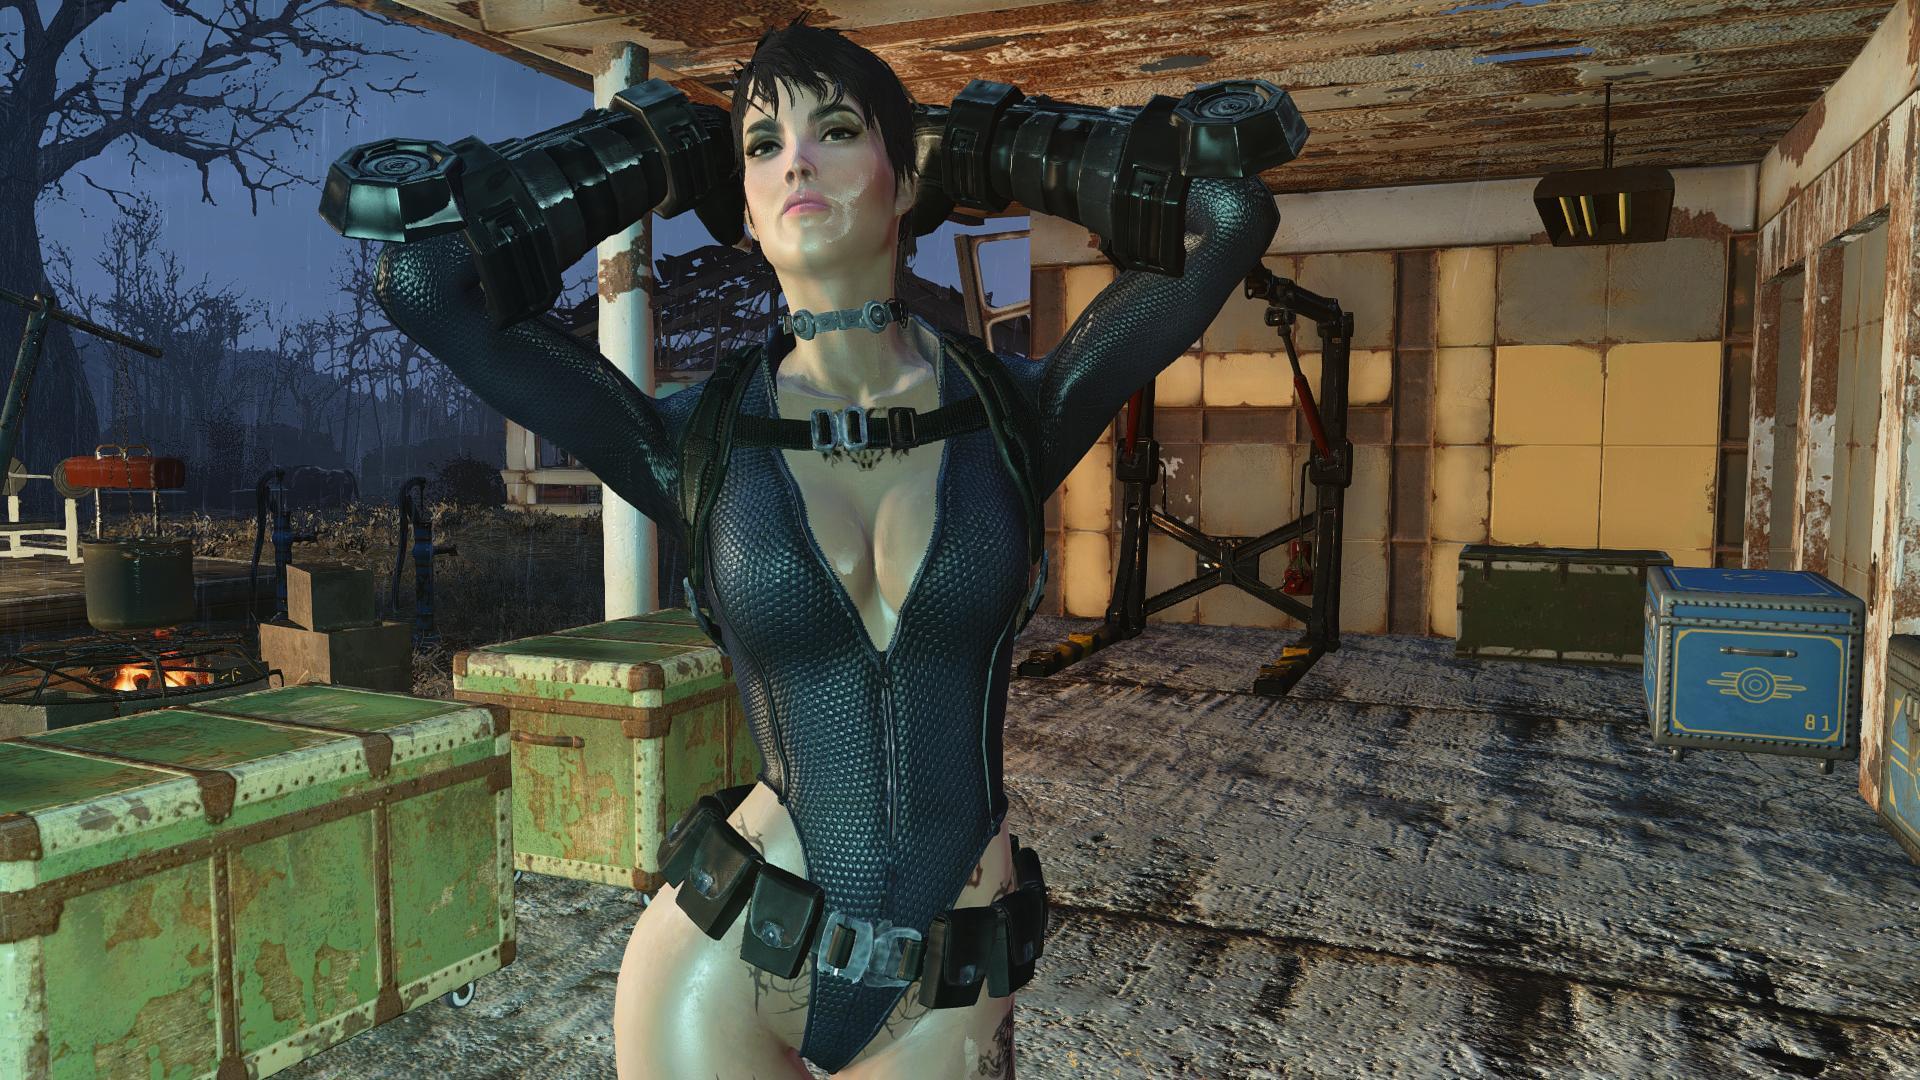 000582.Jpg - Fallout 4